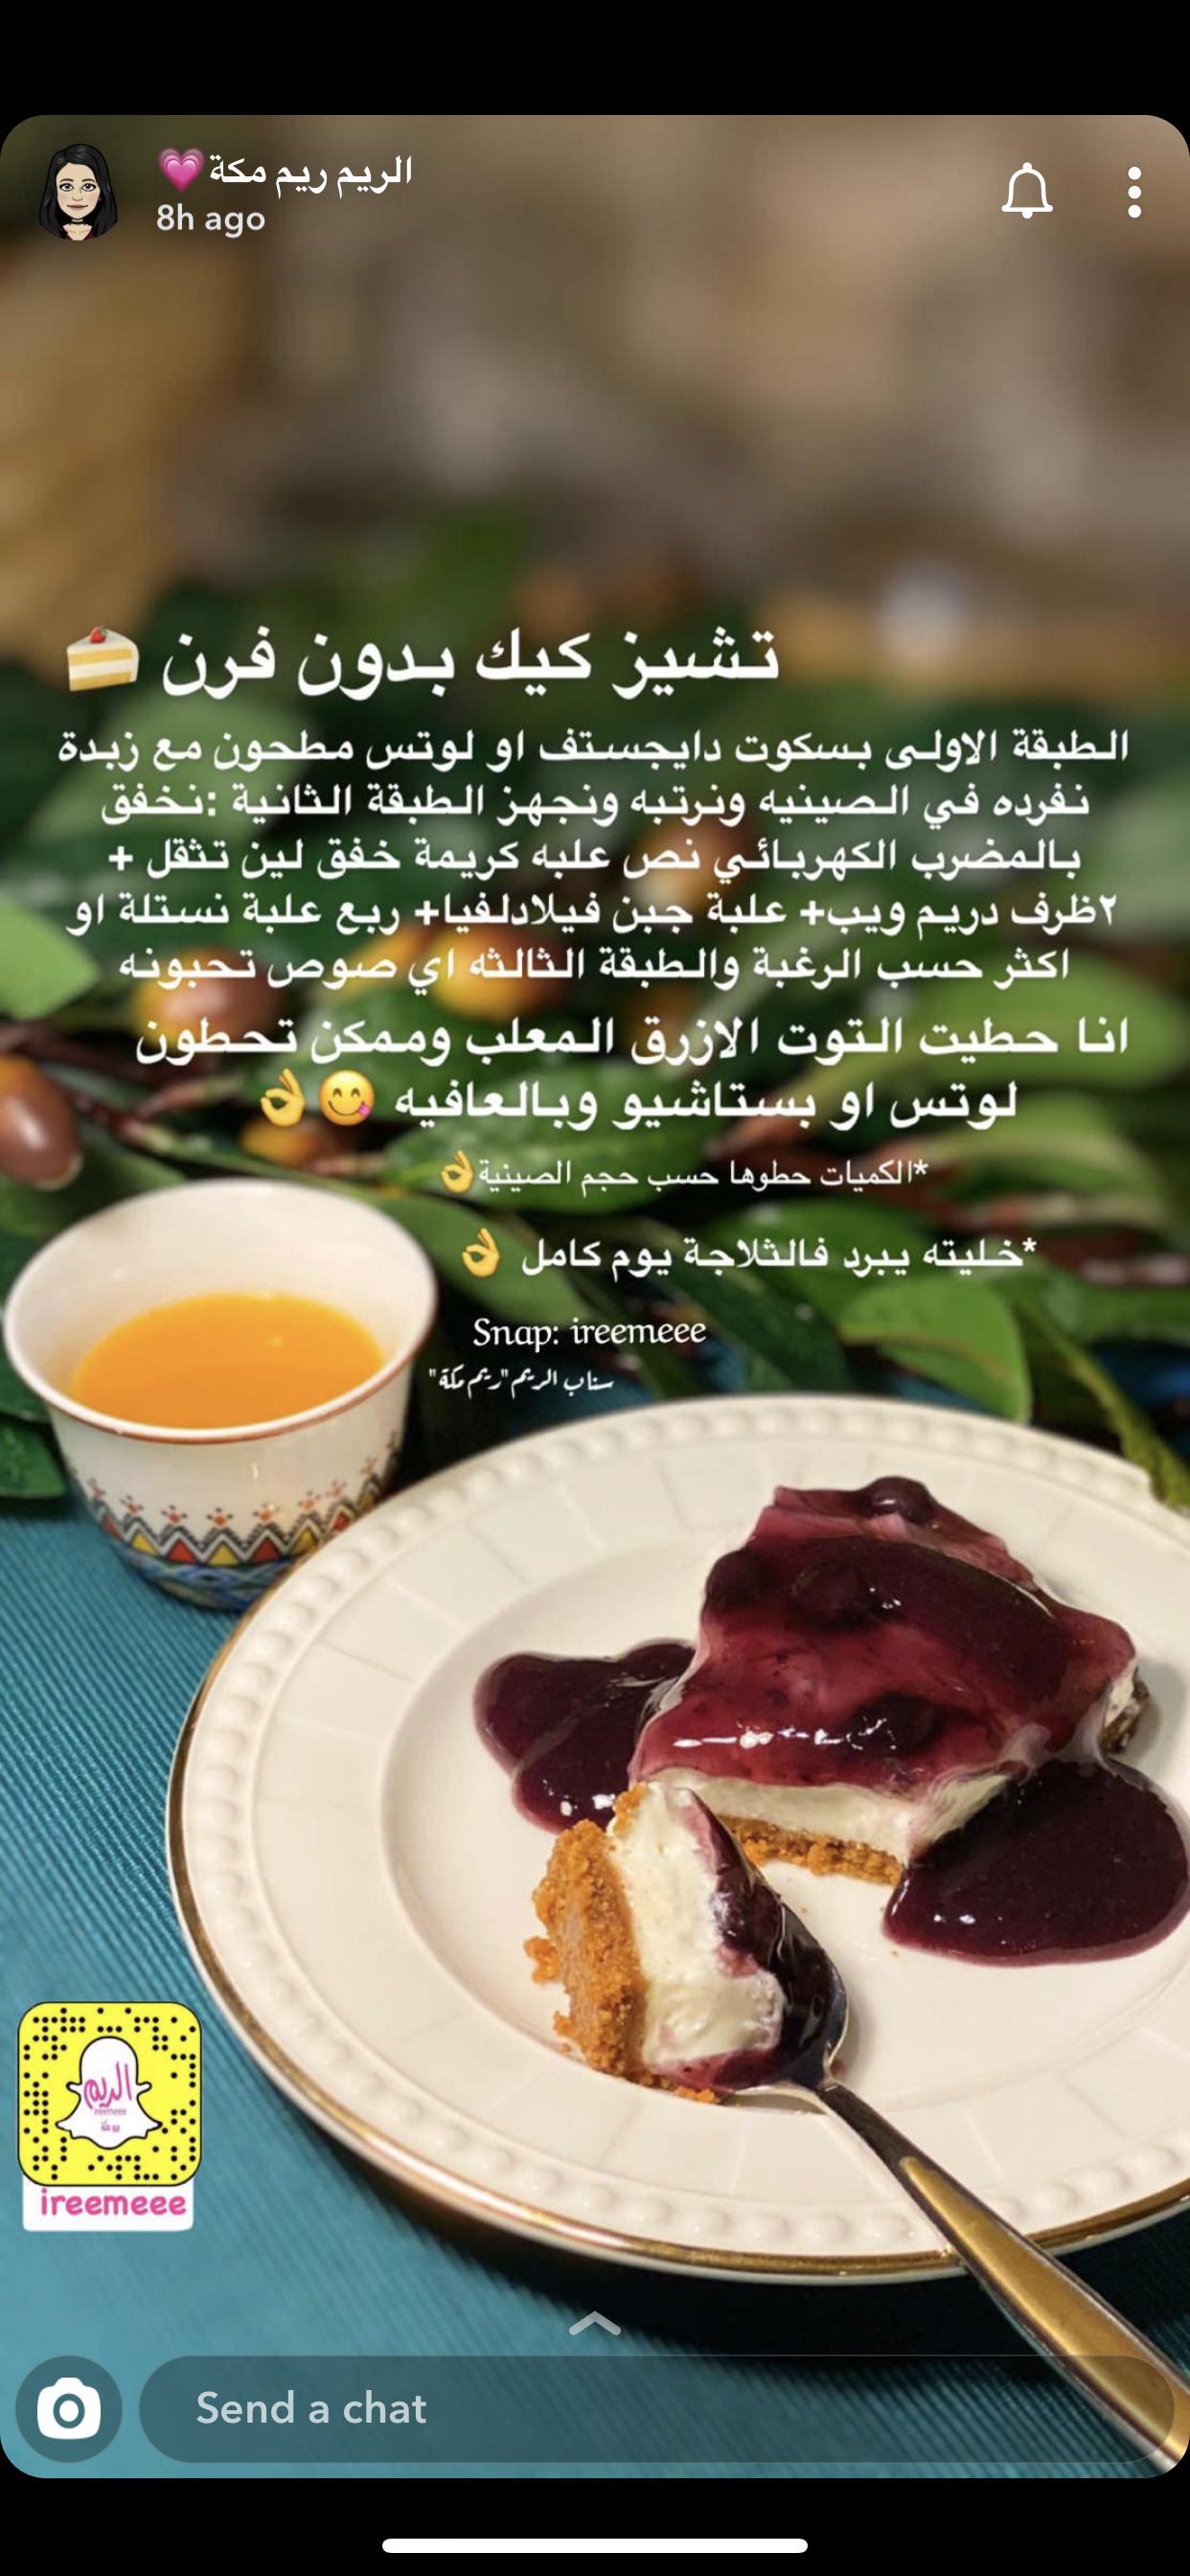 تشيز كيك Cookout Food Yummy Food Dessert Food Receipes